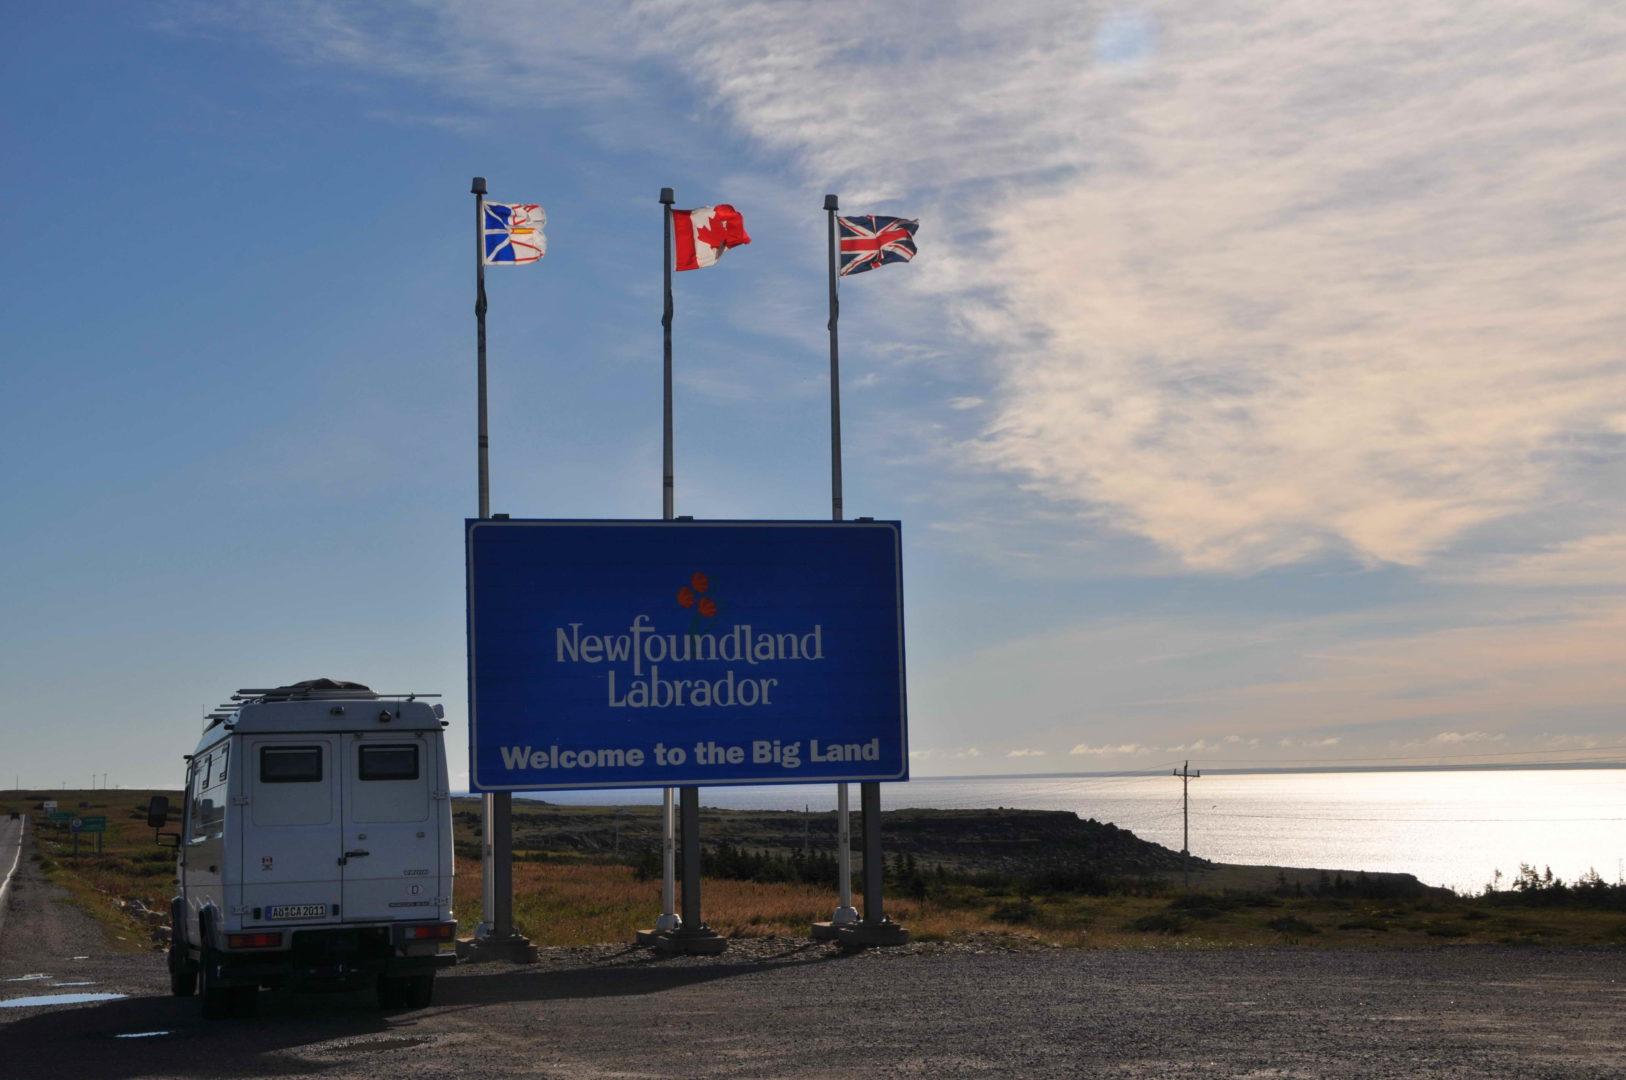 Wohnmobilverschiffung nach Kanada - KanadaSpezialist.com